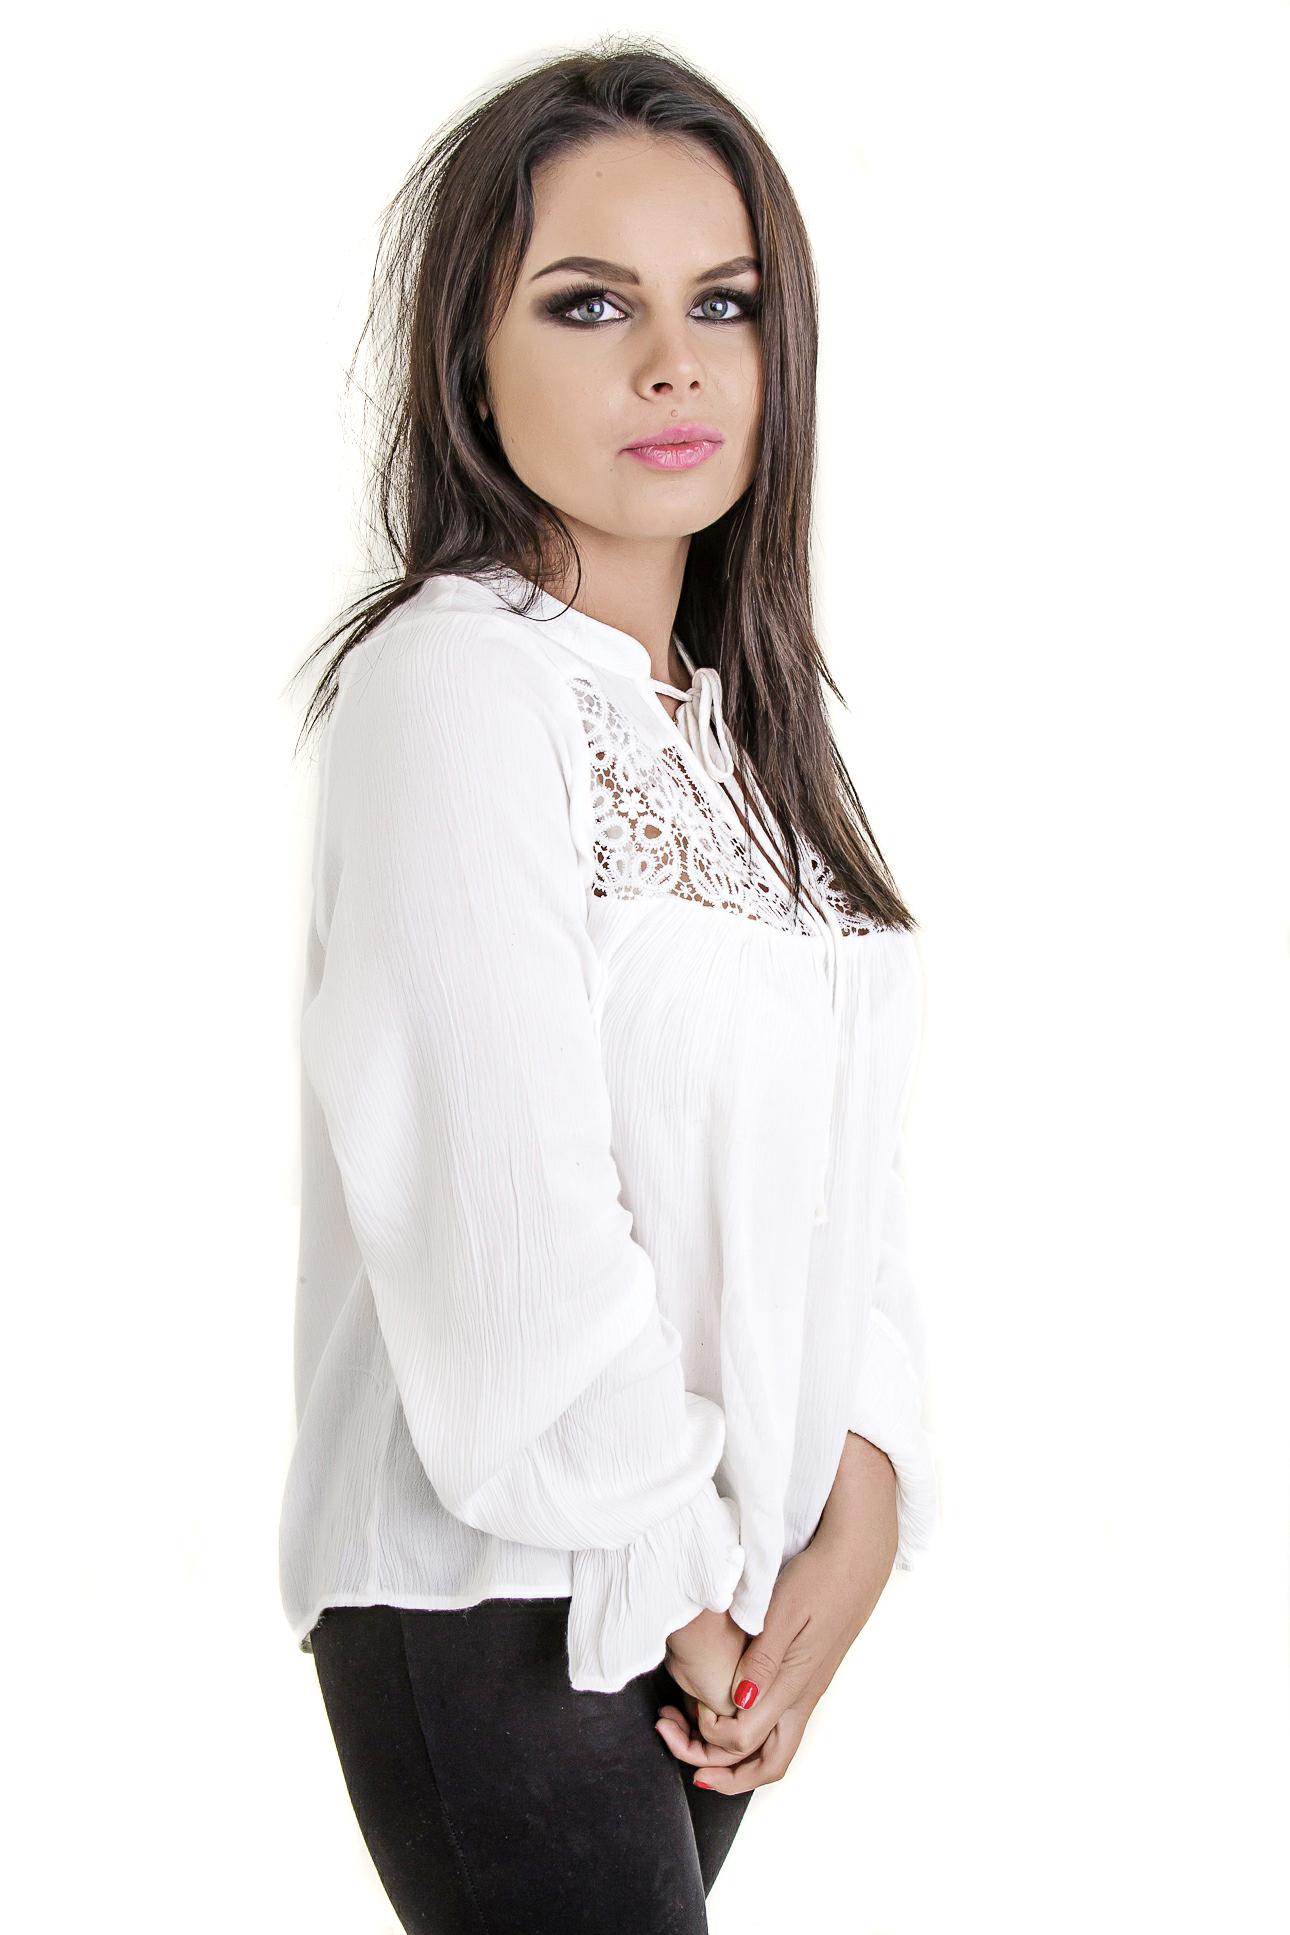 Gabriella Lopata